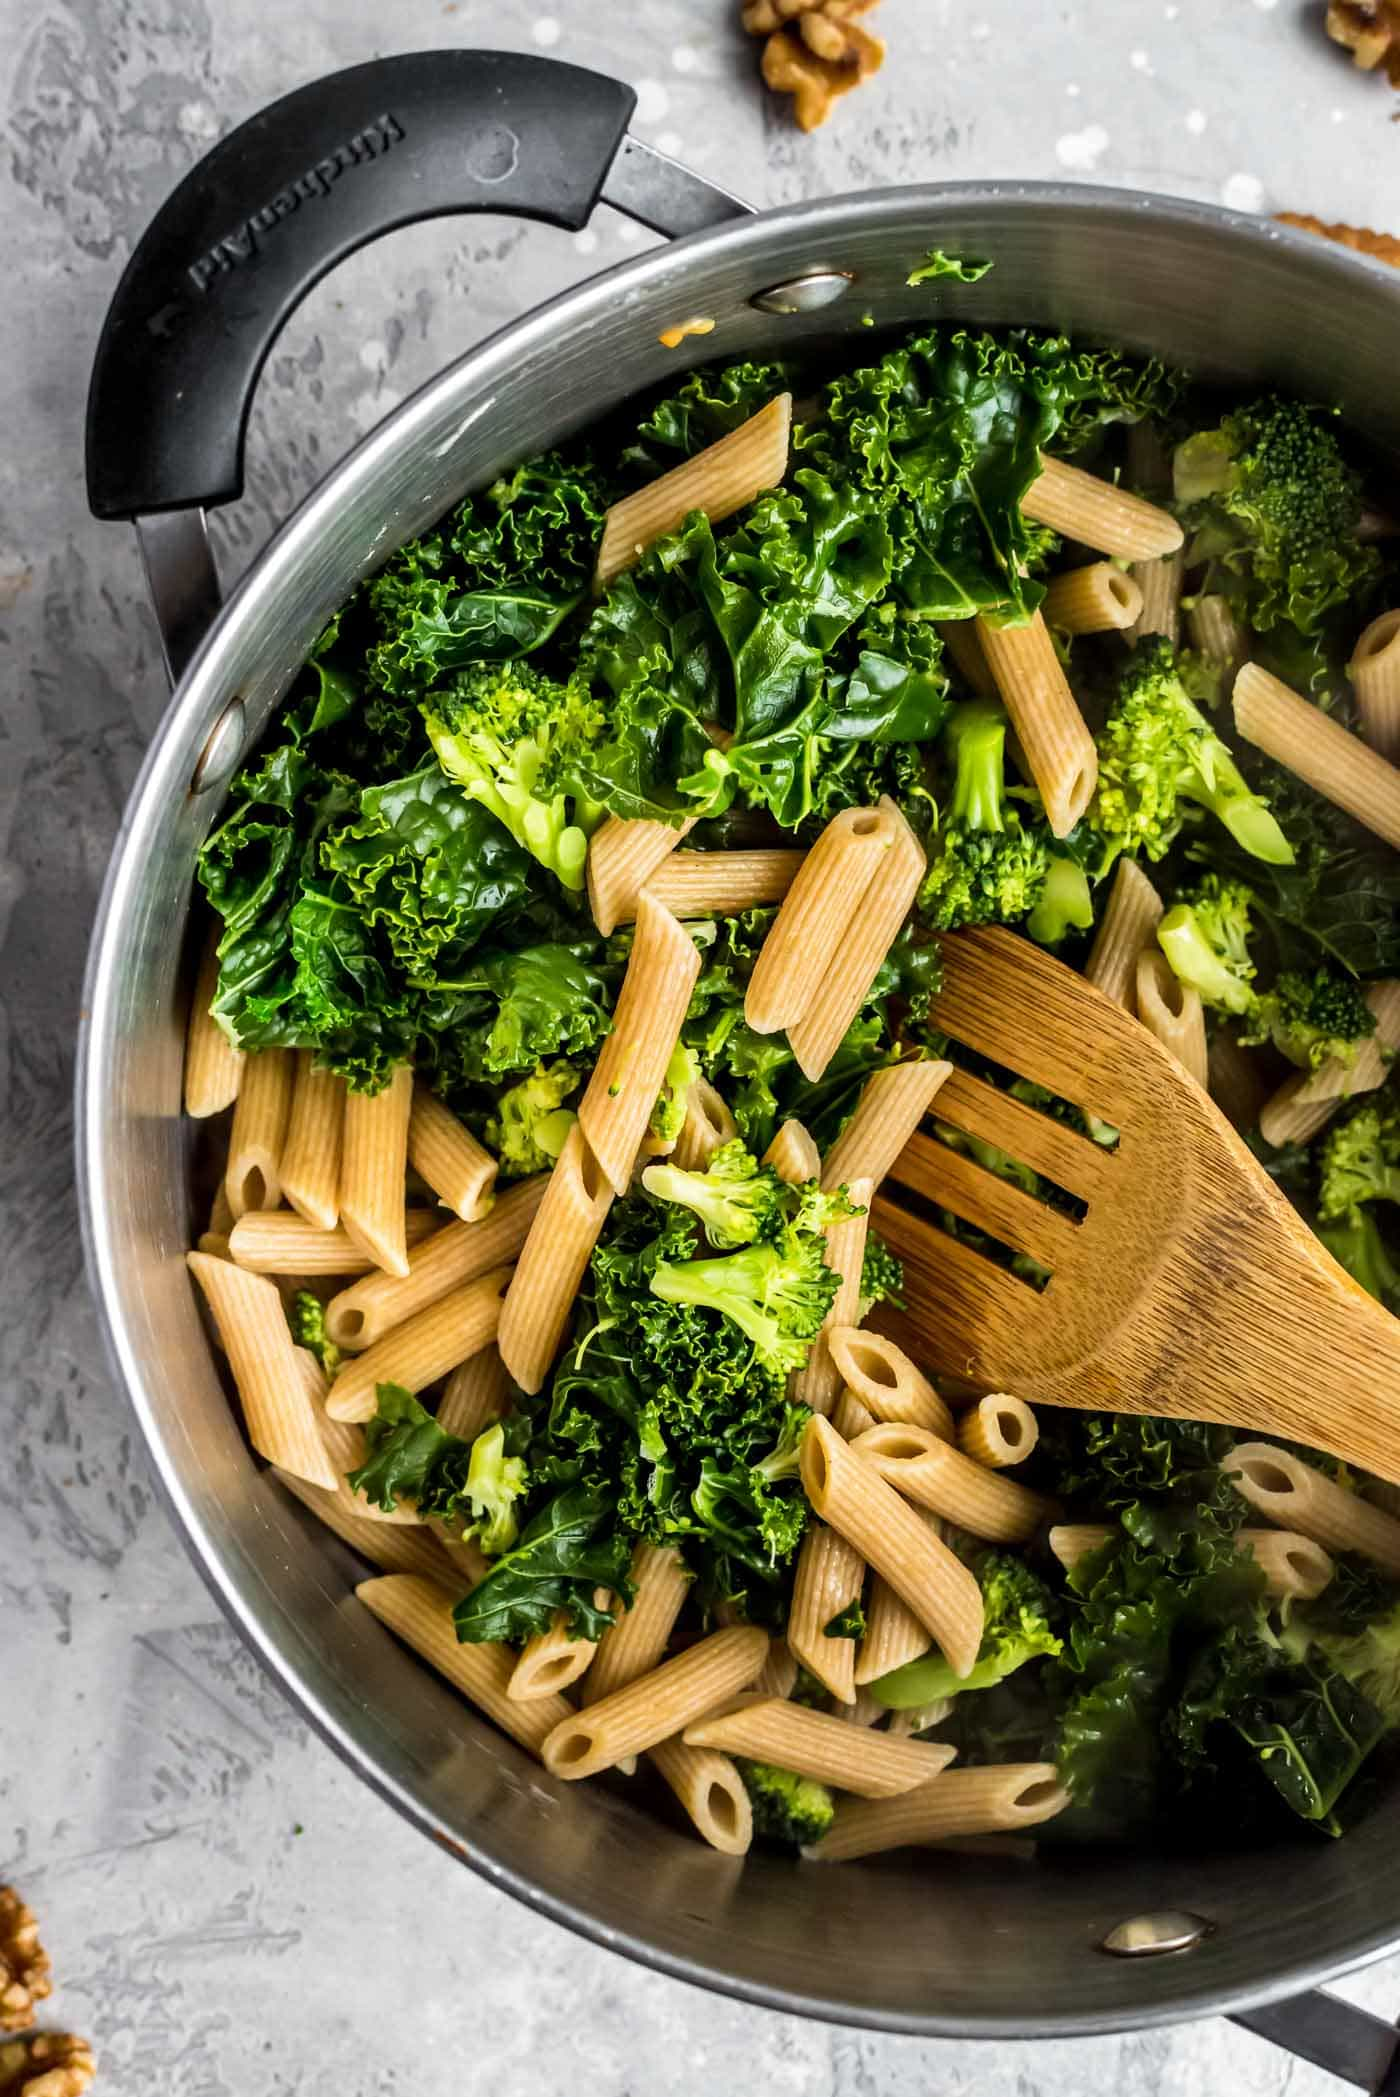 Vegan Broccoli and Kale Red Pepper Pesto Pasta